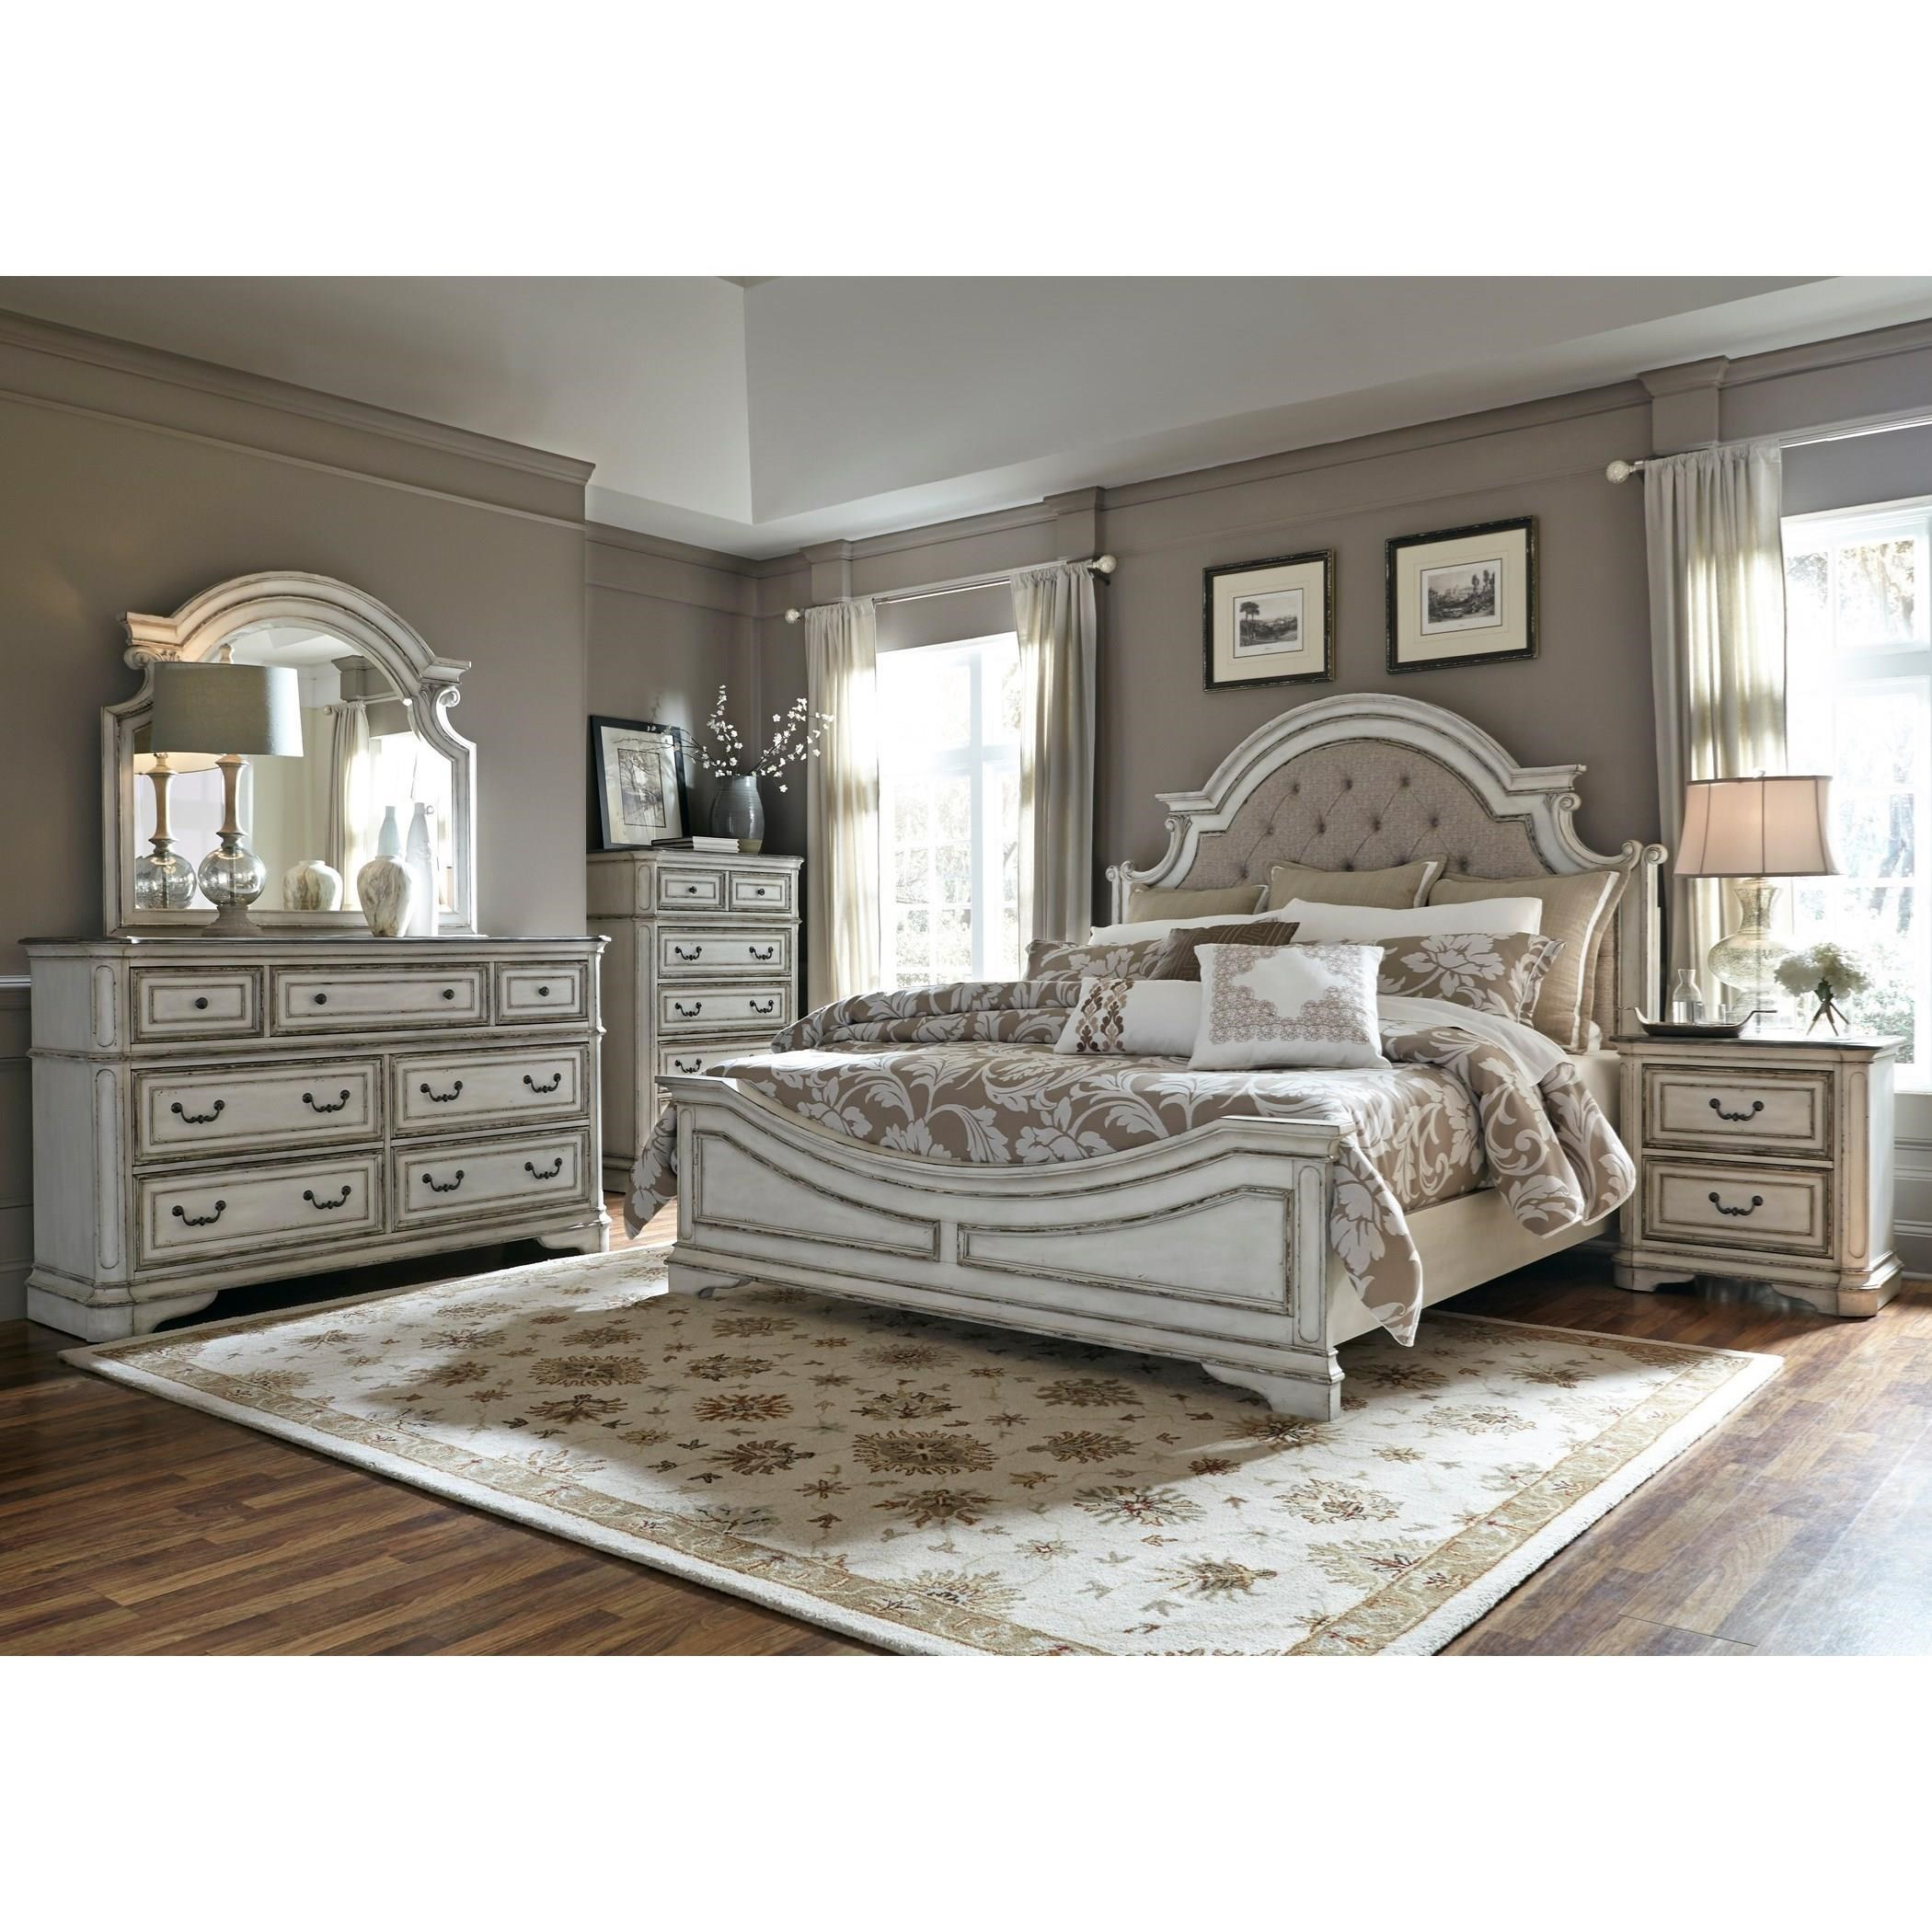 Liberty Furniture Magnolia Manor Libe Grp 244 Queensuite Queen Upholstered Bed Dresser Mirror